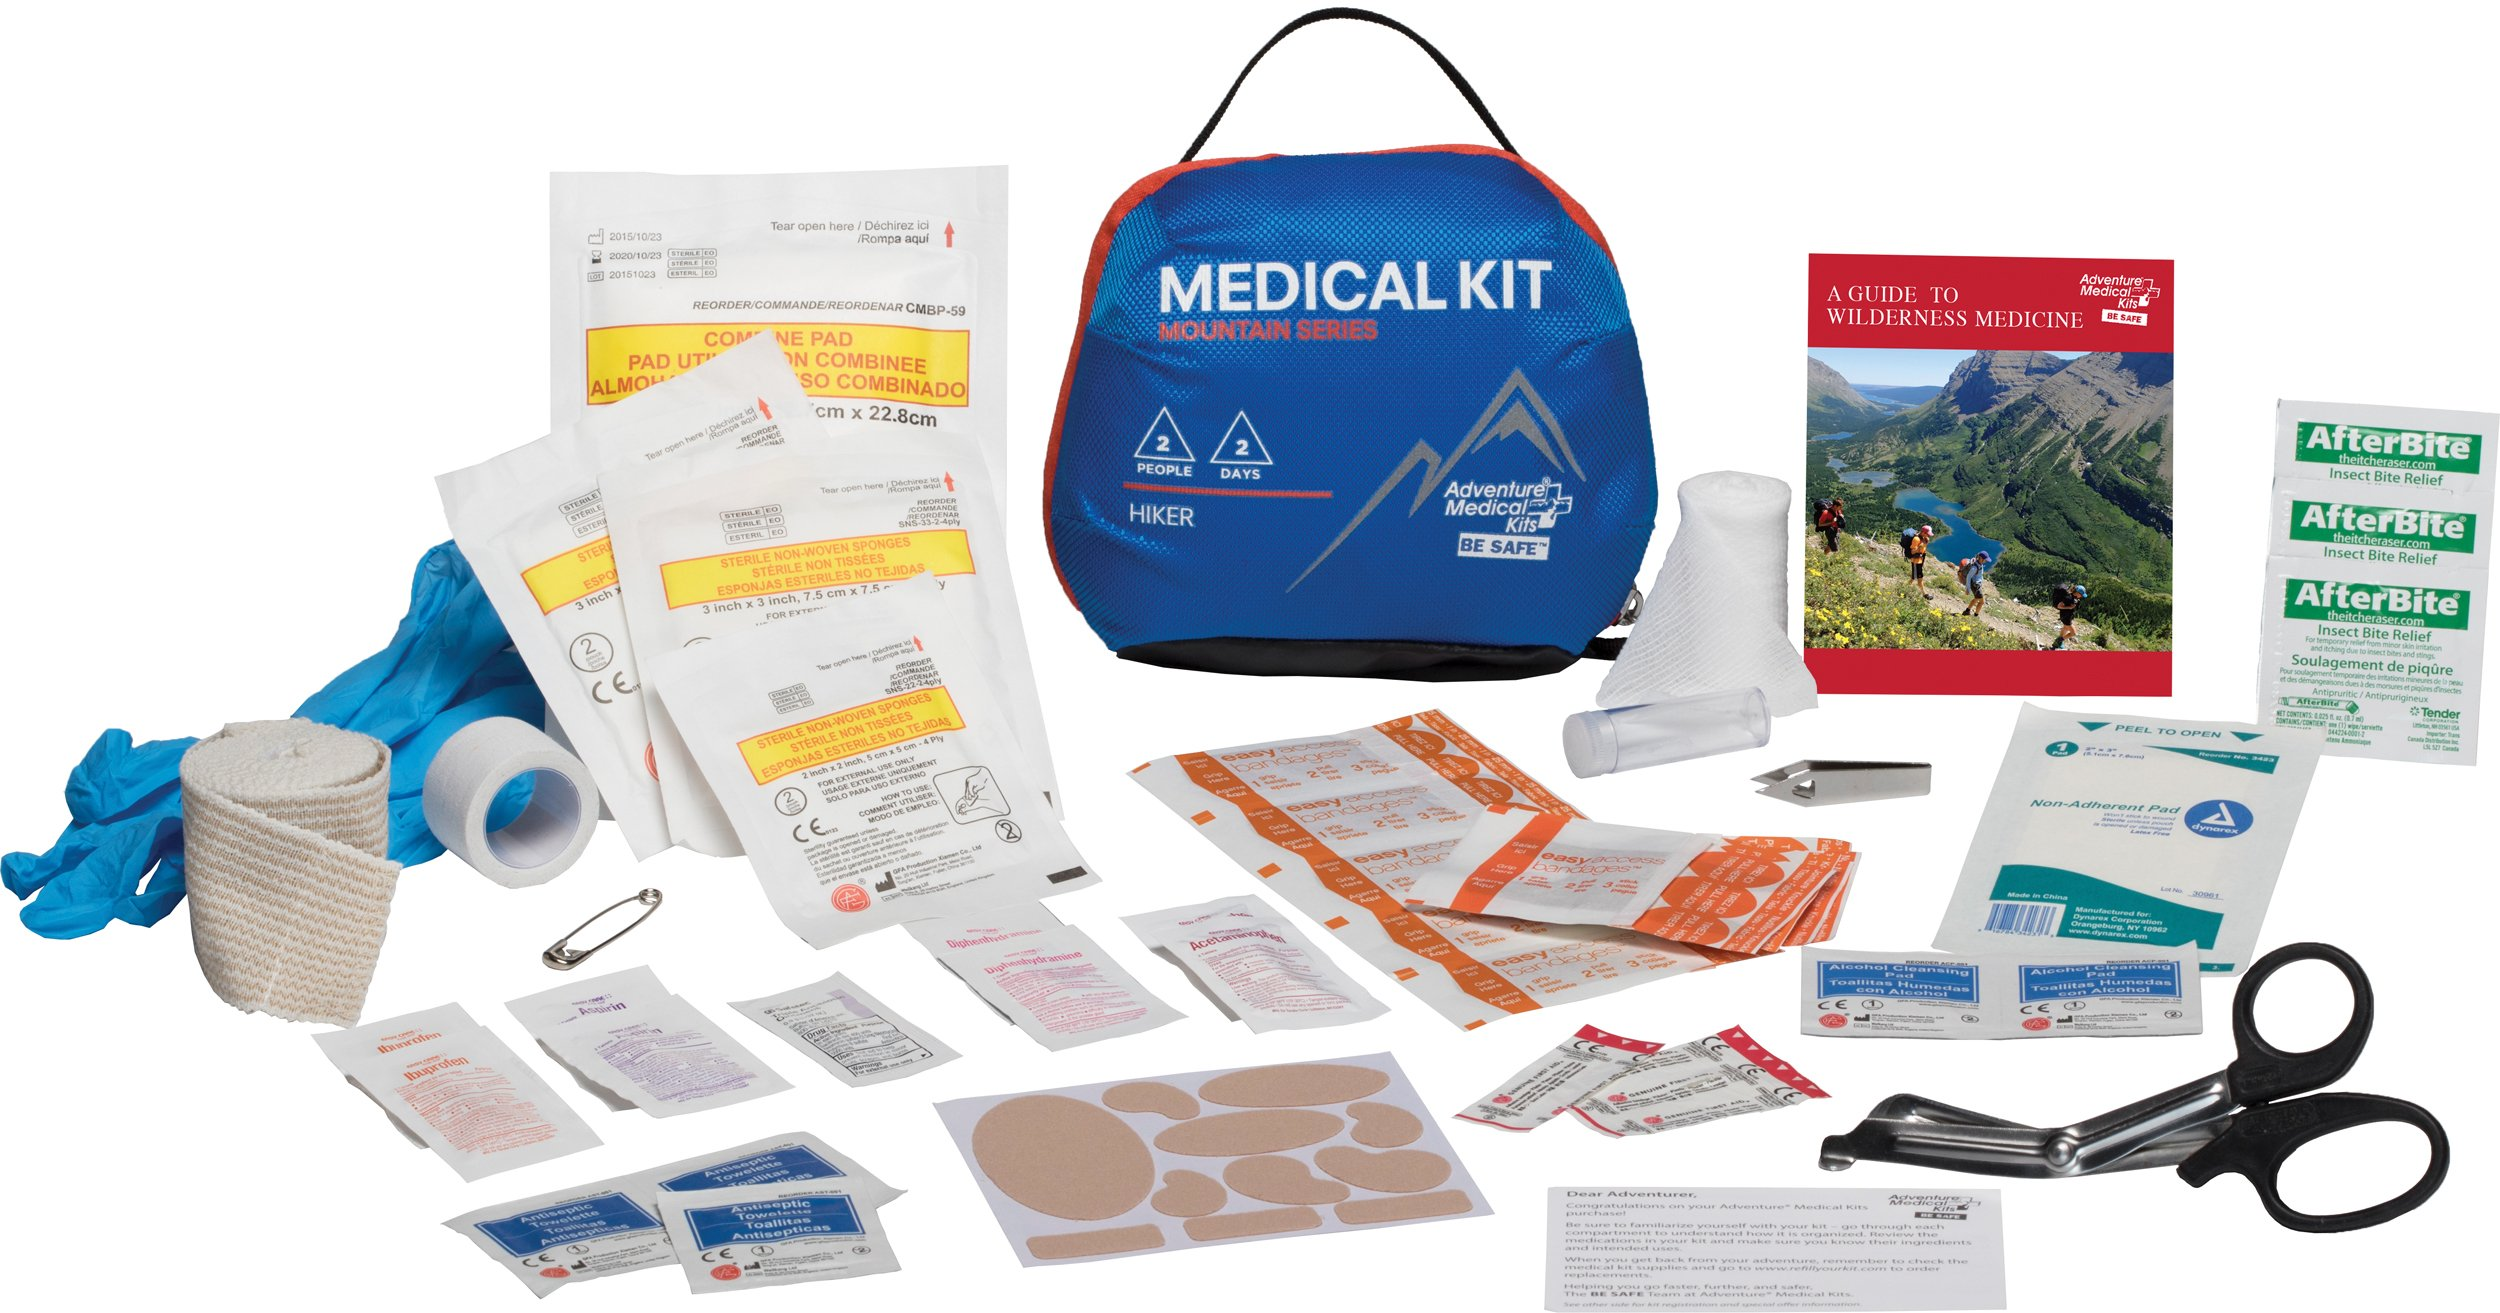 Adventure Medical Kits Mountain Series Hiker First Aid Kit